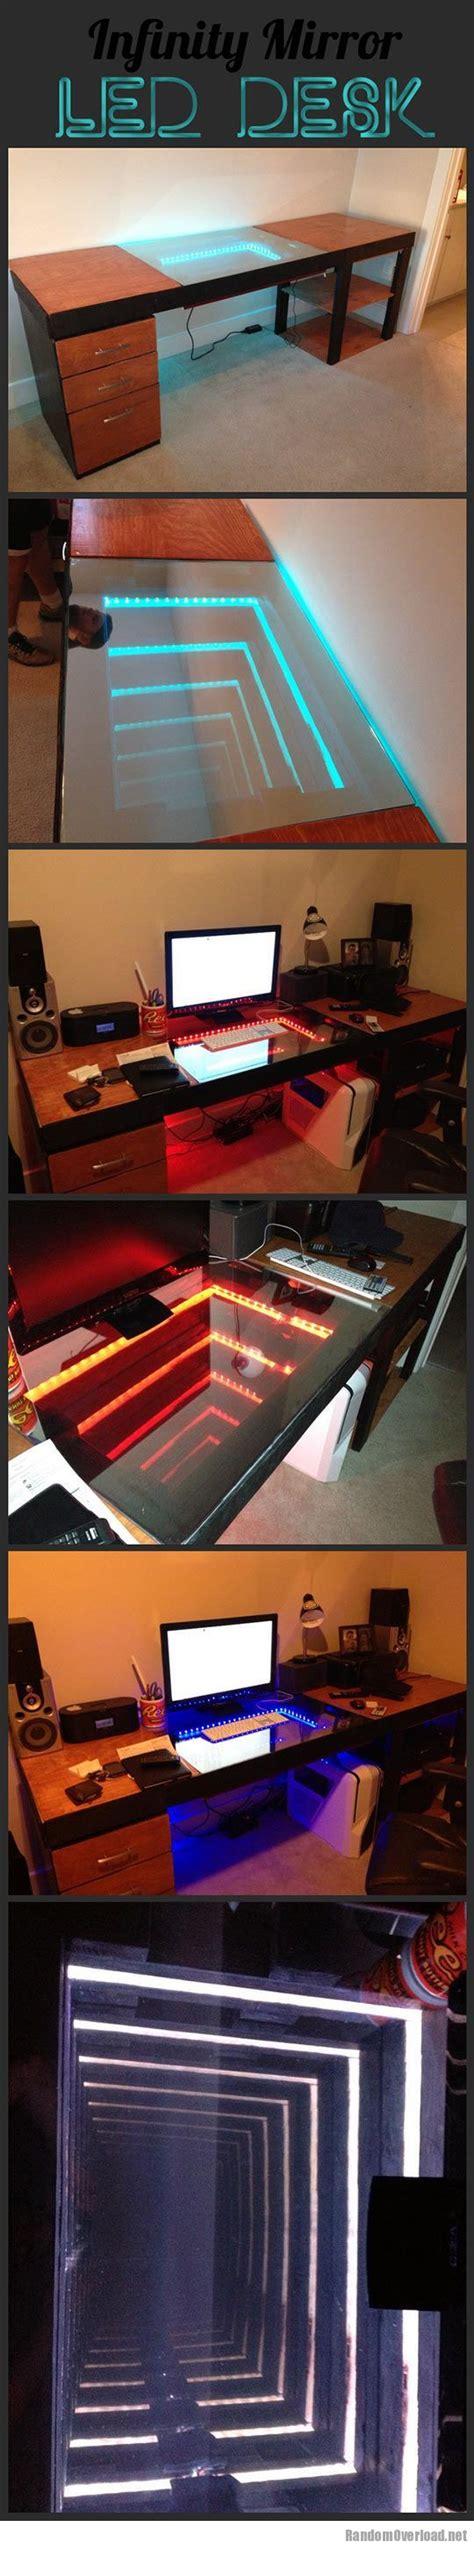 infinity mirror computer desk infinity mirror desk randomoverload